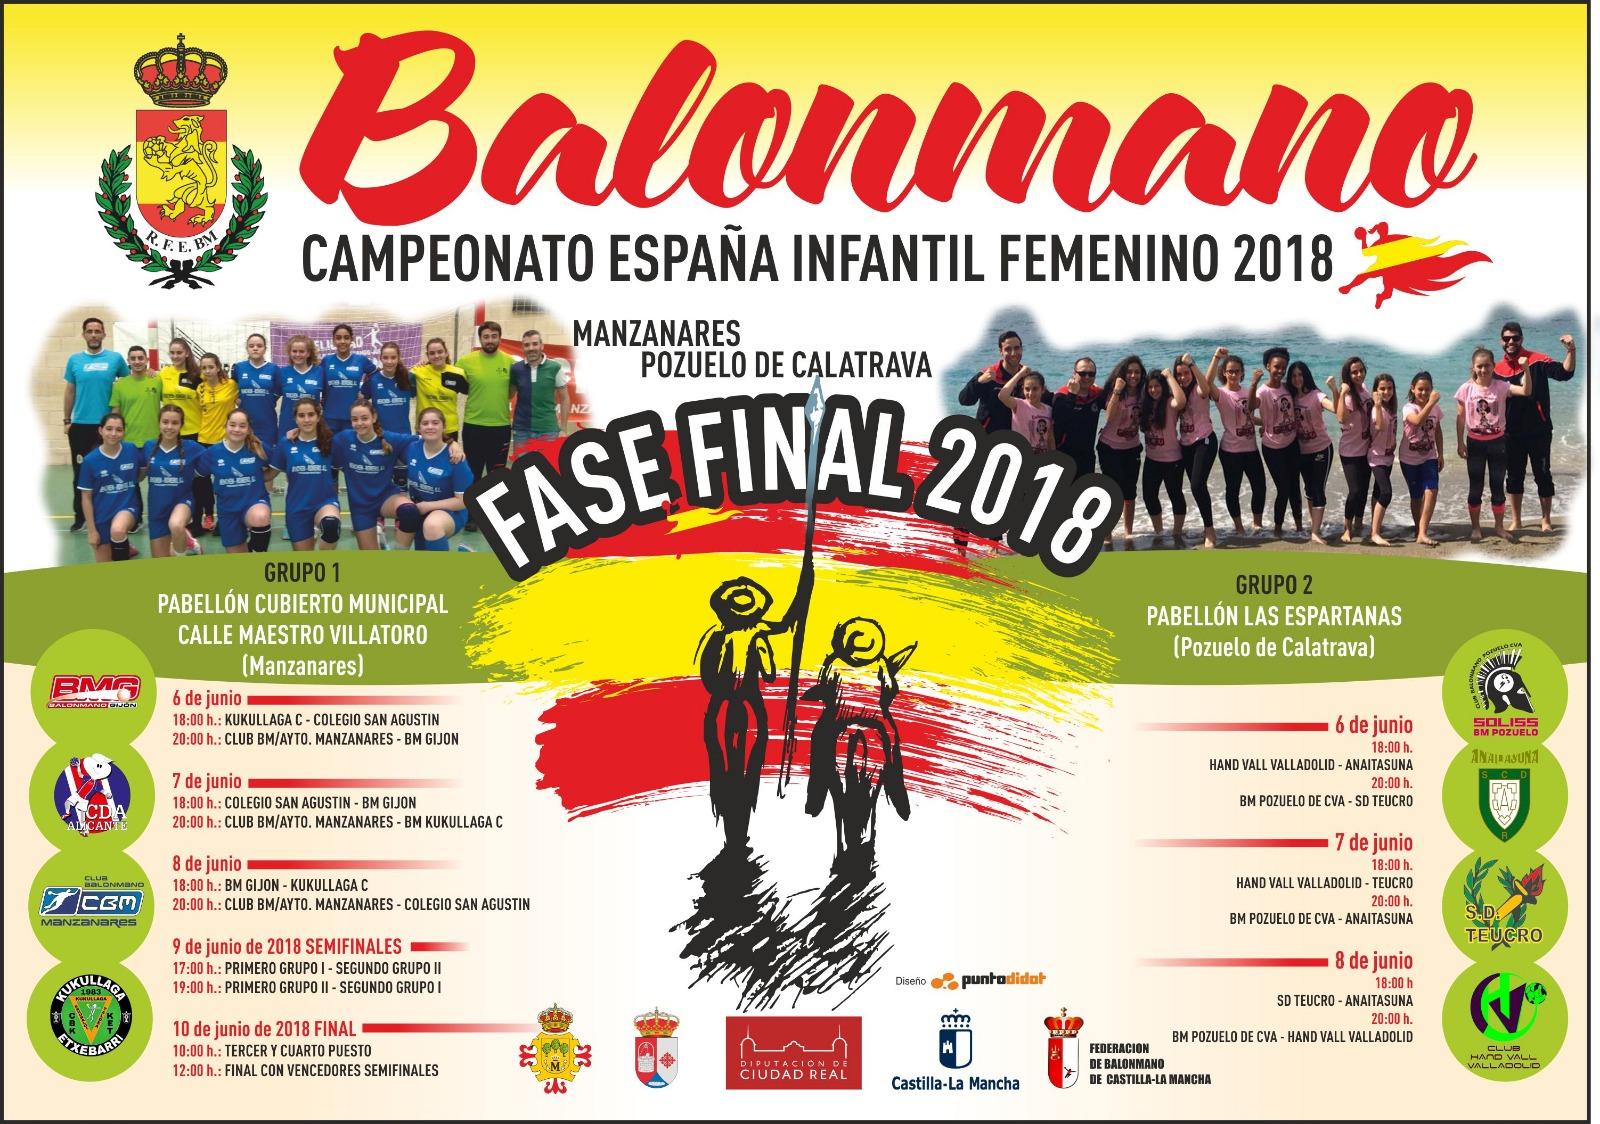 Fase Final Campeonato de España 2018 de Balonmano Infantil Femenino